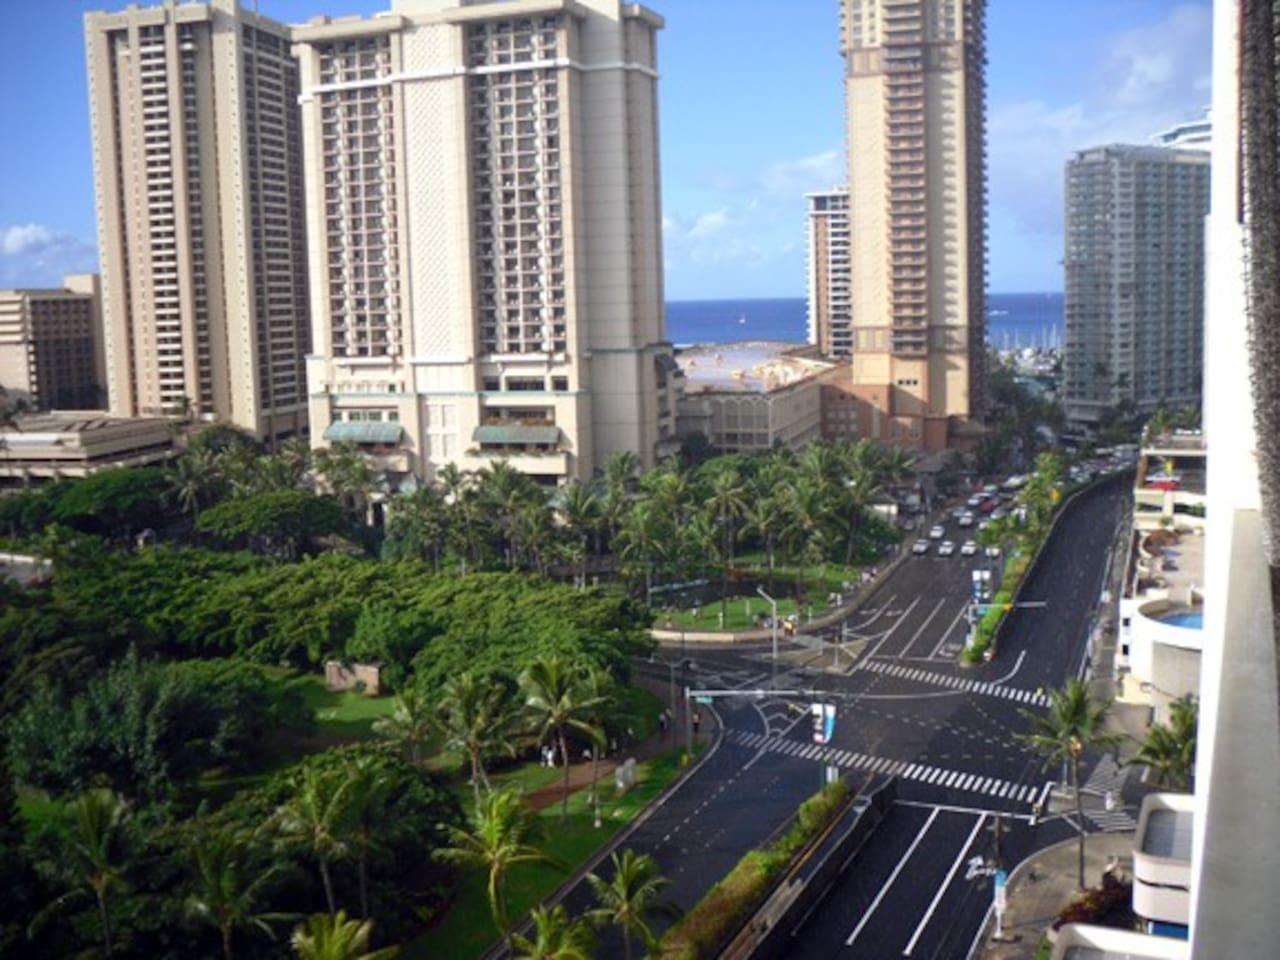 View from lanai (balcony.)